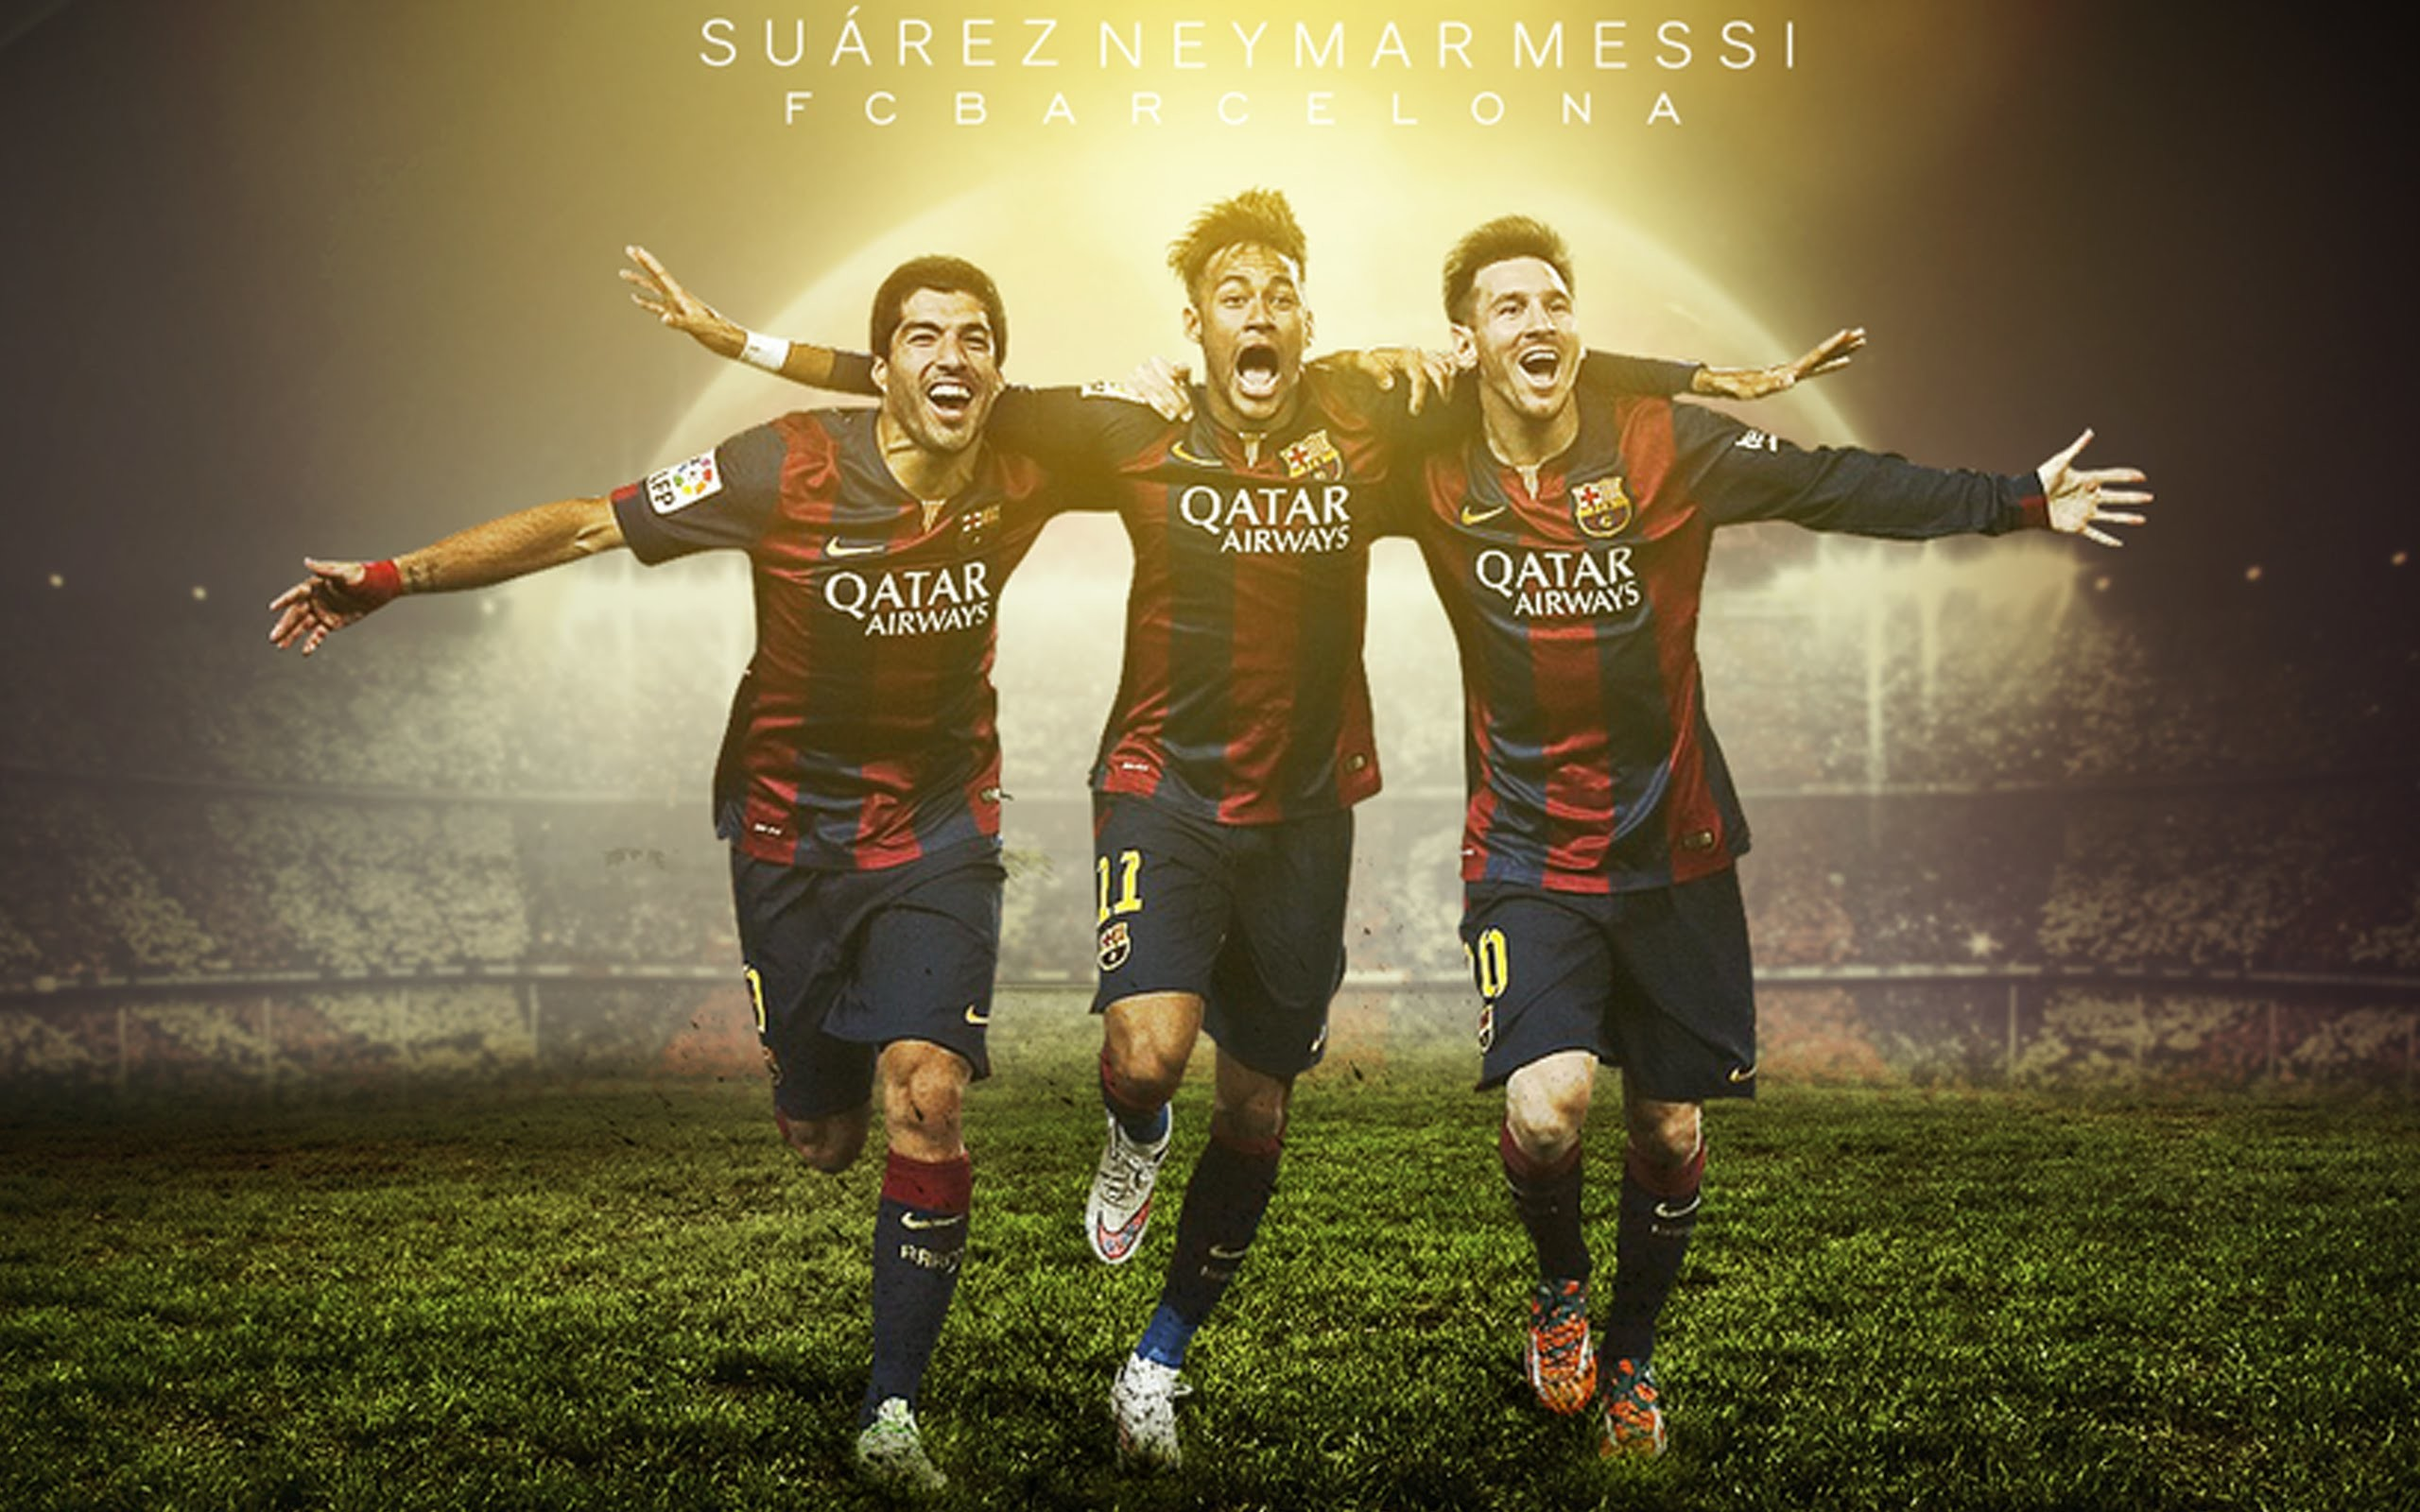 Suarez Neymar Messi Wallpaper